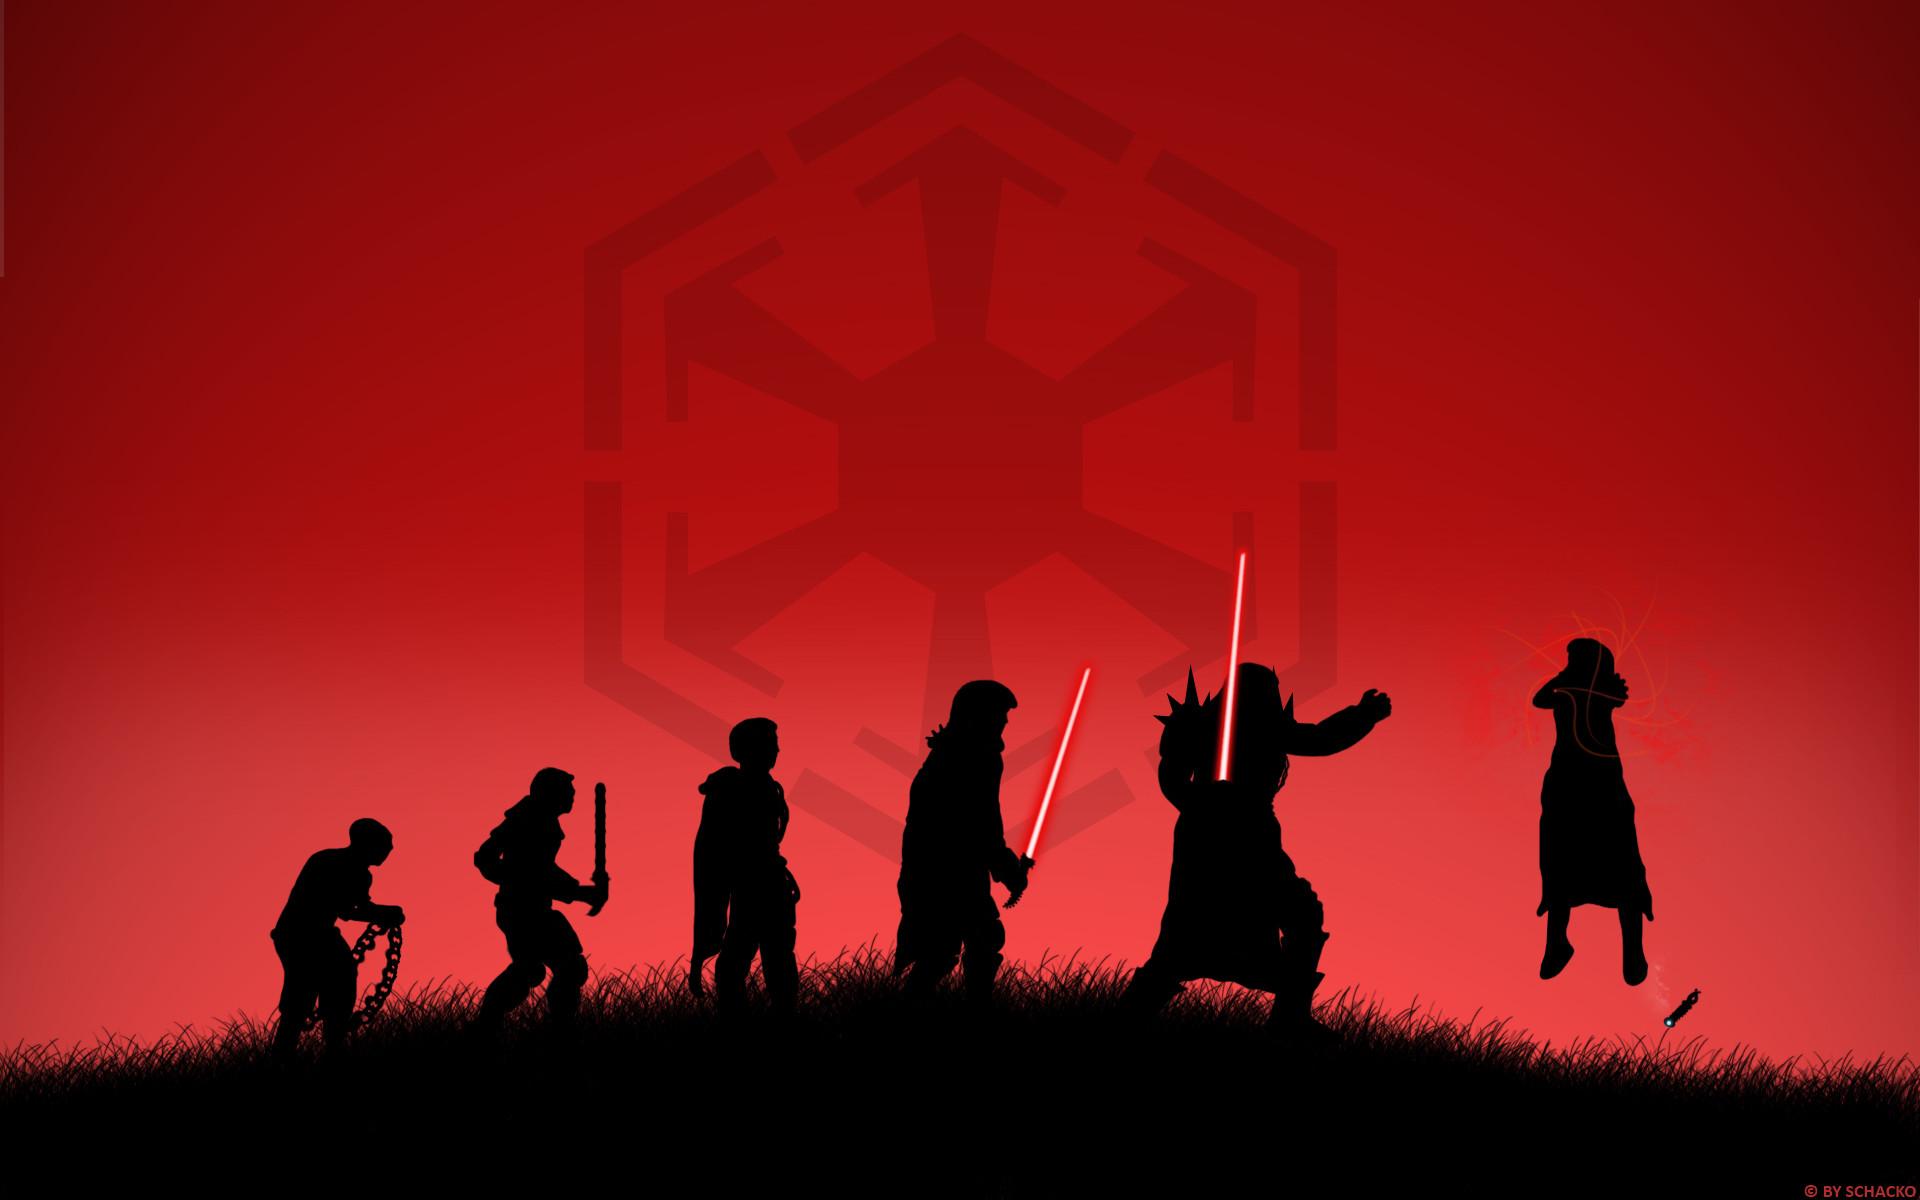 Sith Code Wallpaper Swtor sith warrior evolution